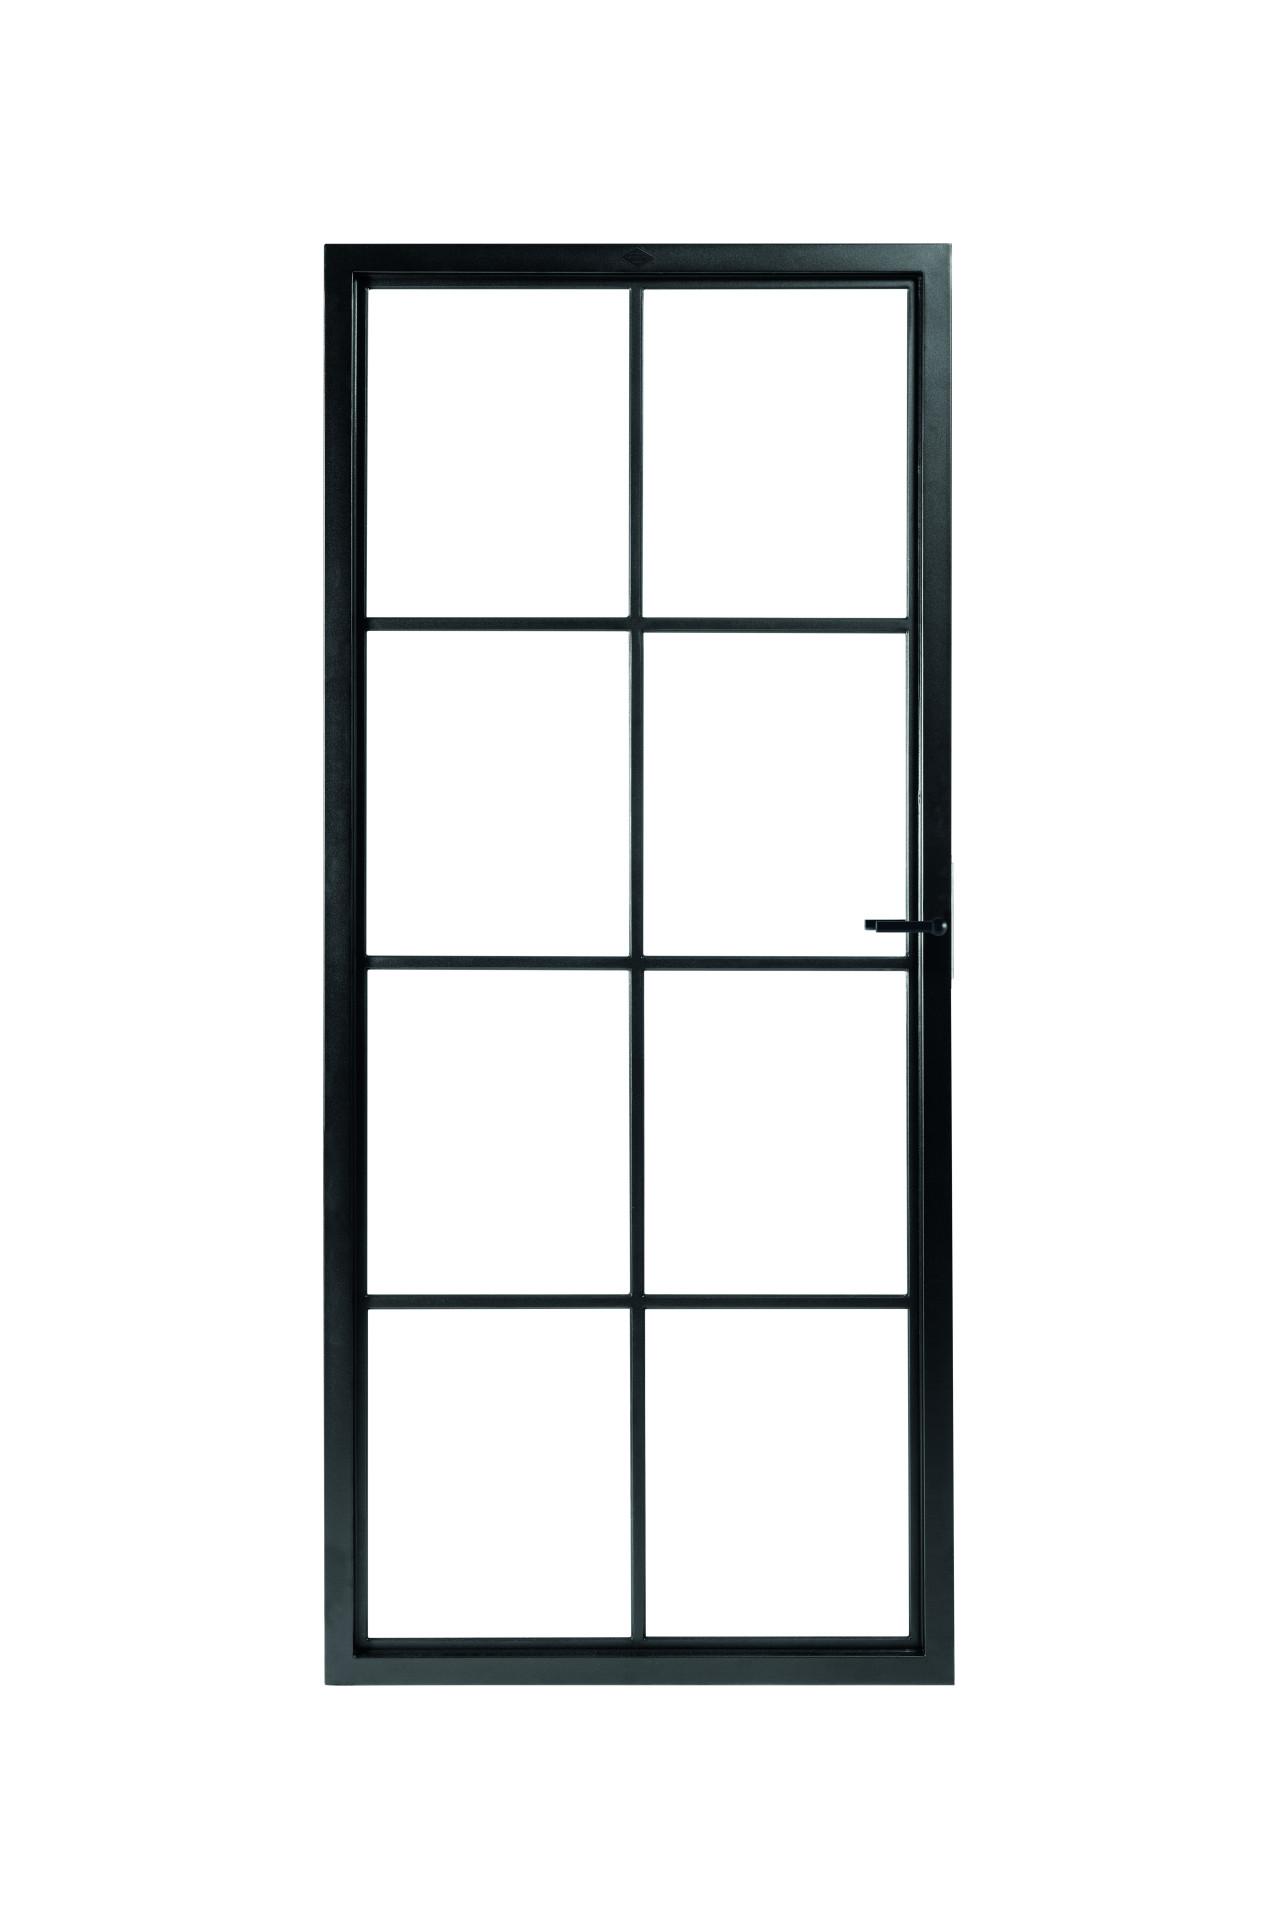 steelit-invisible-classic8-enkel.jpg